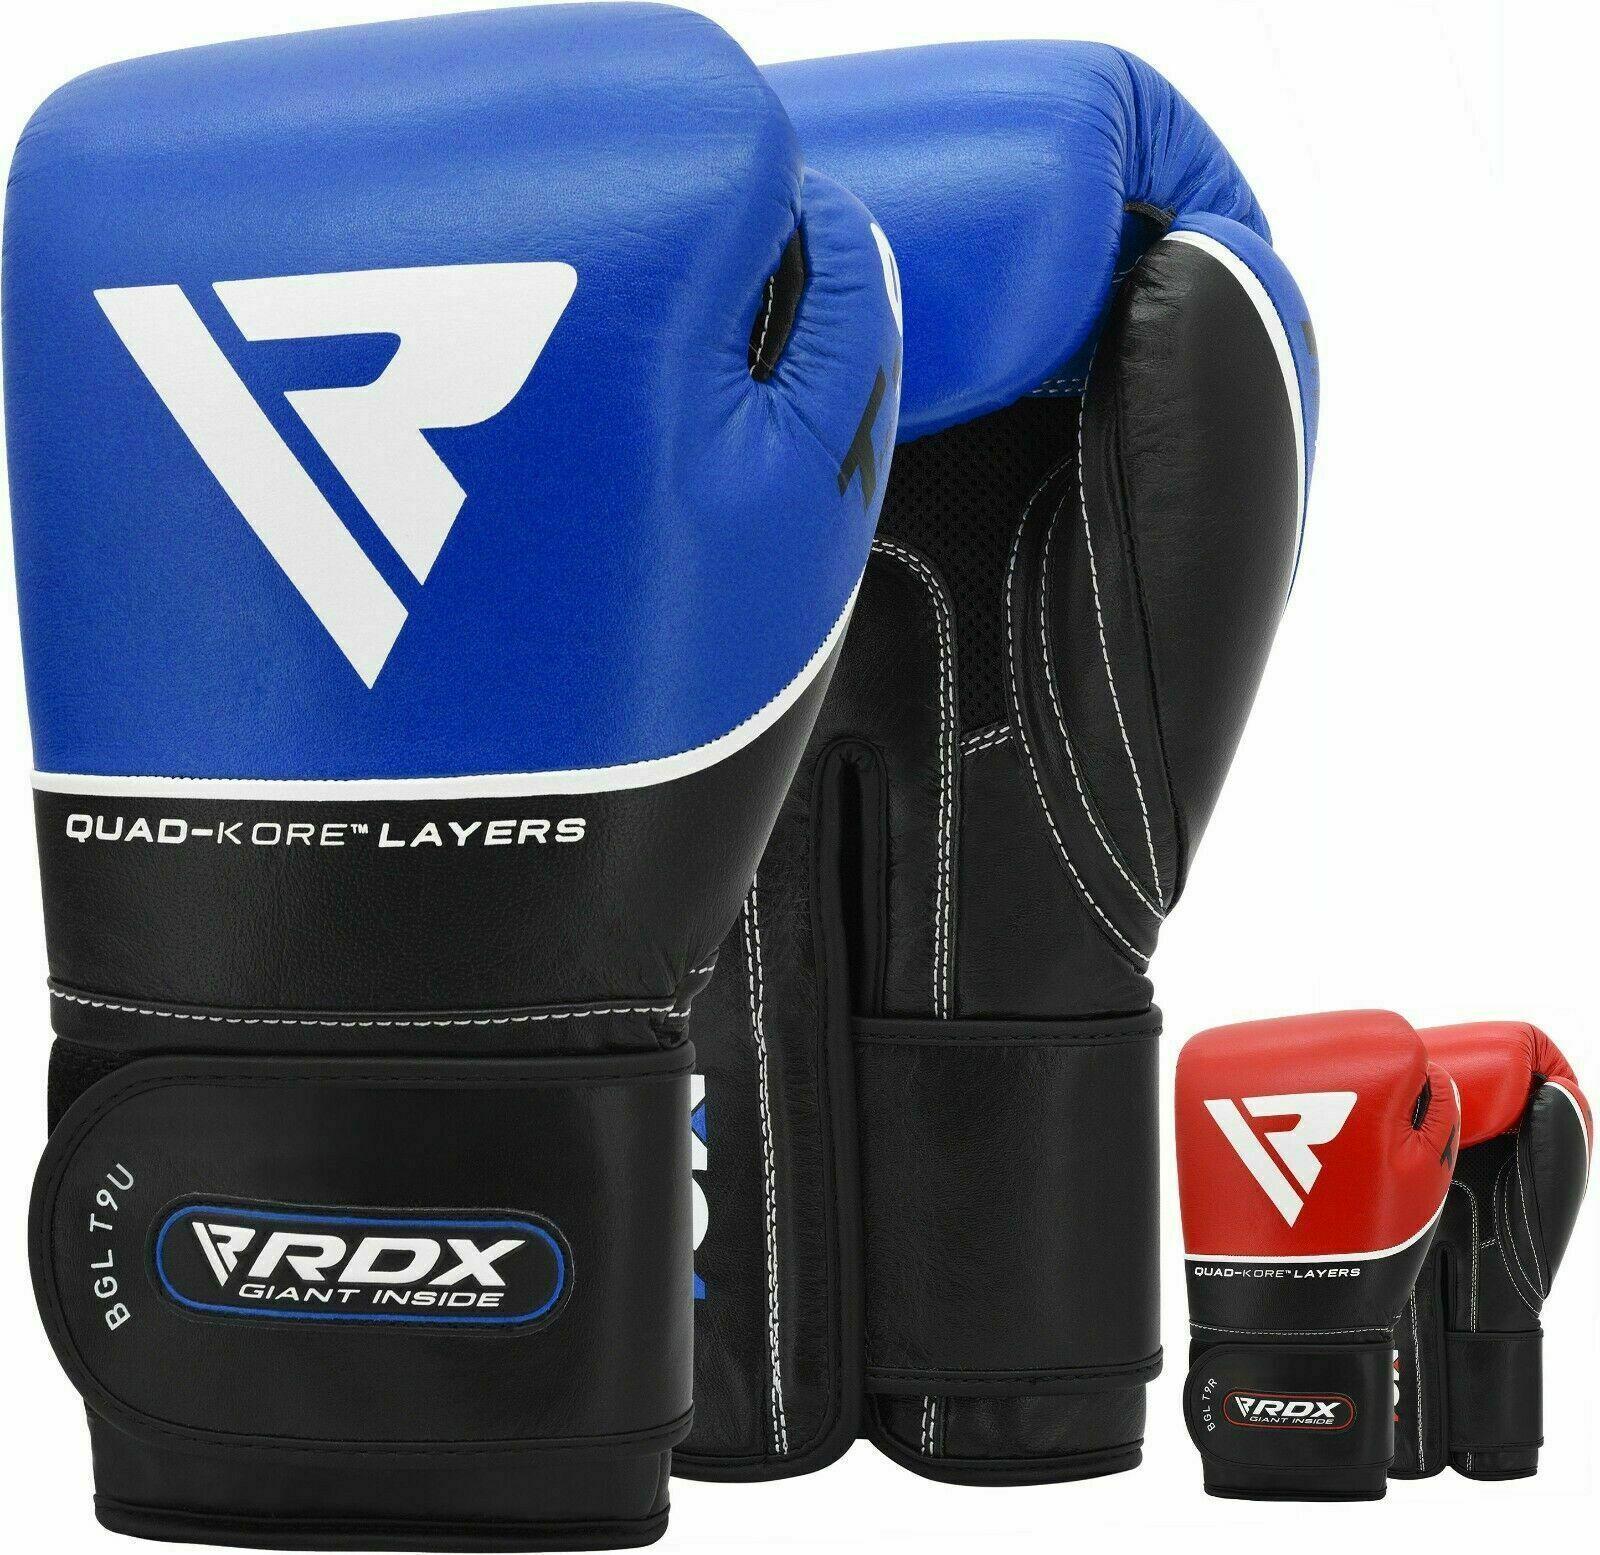 RDX In Pelle MMA Guantoni Da Pugilato tuttienauominito Sparring Punch borsa Kickscatolaing T9